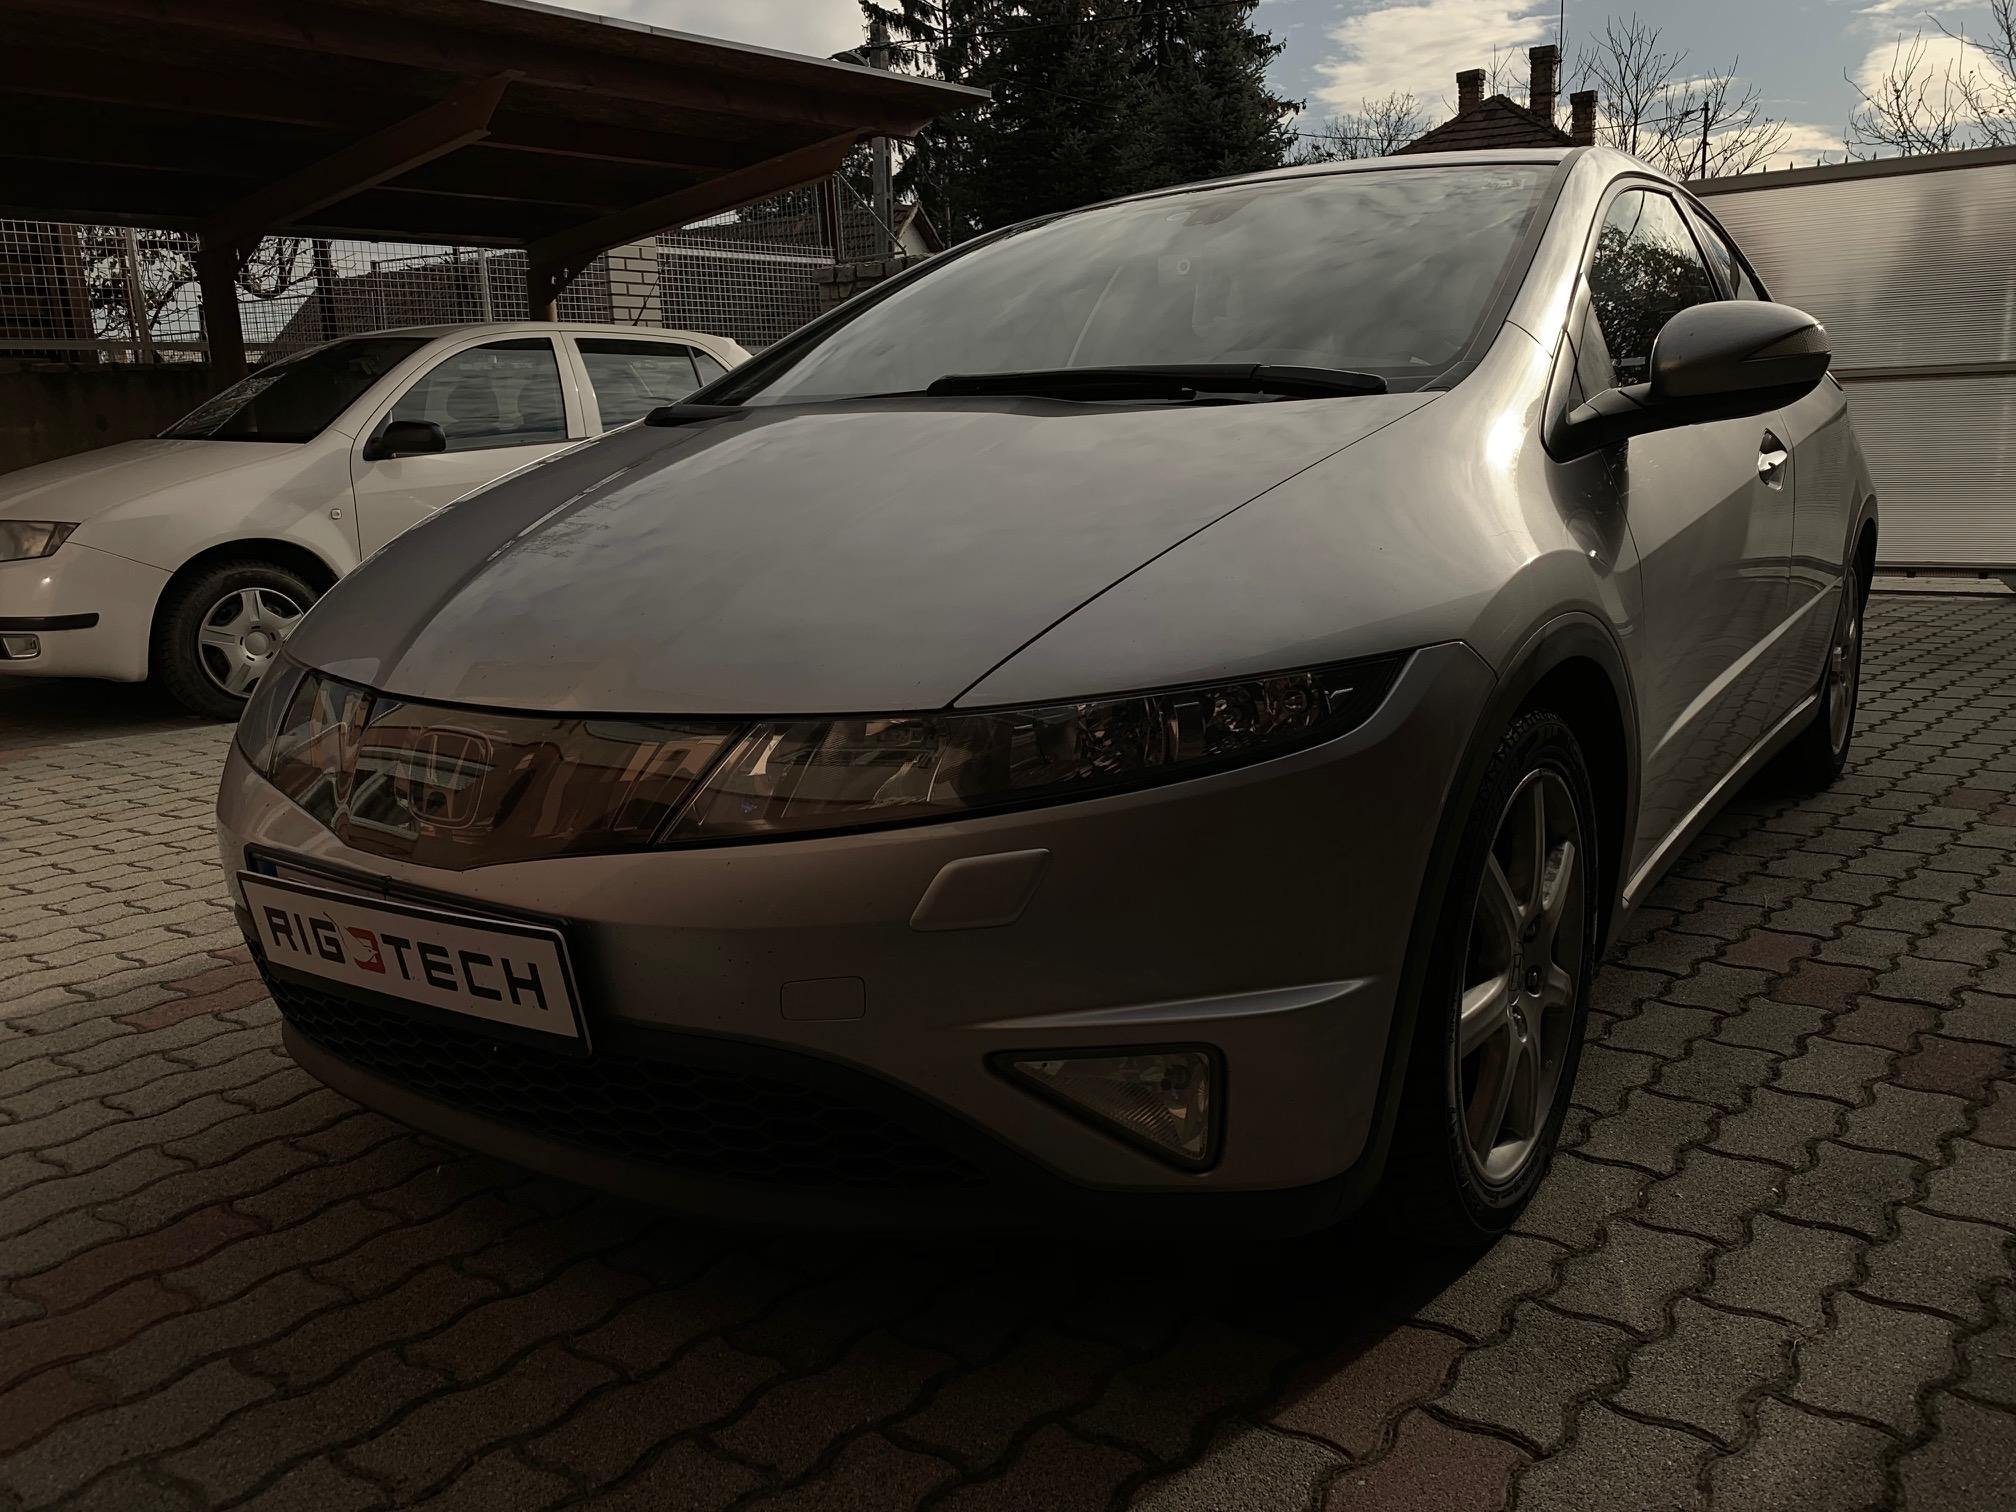 Honda-Civic-22d-140Le-Chiptuning